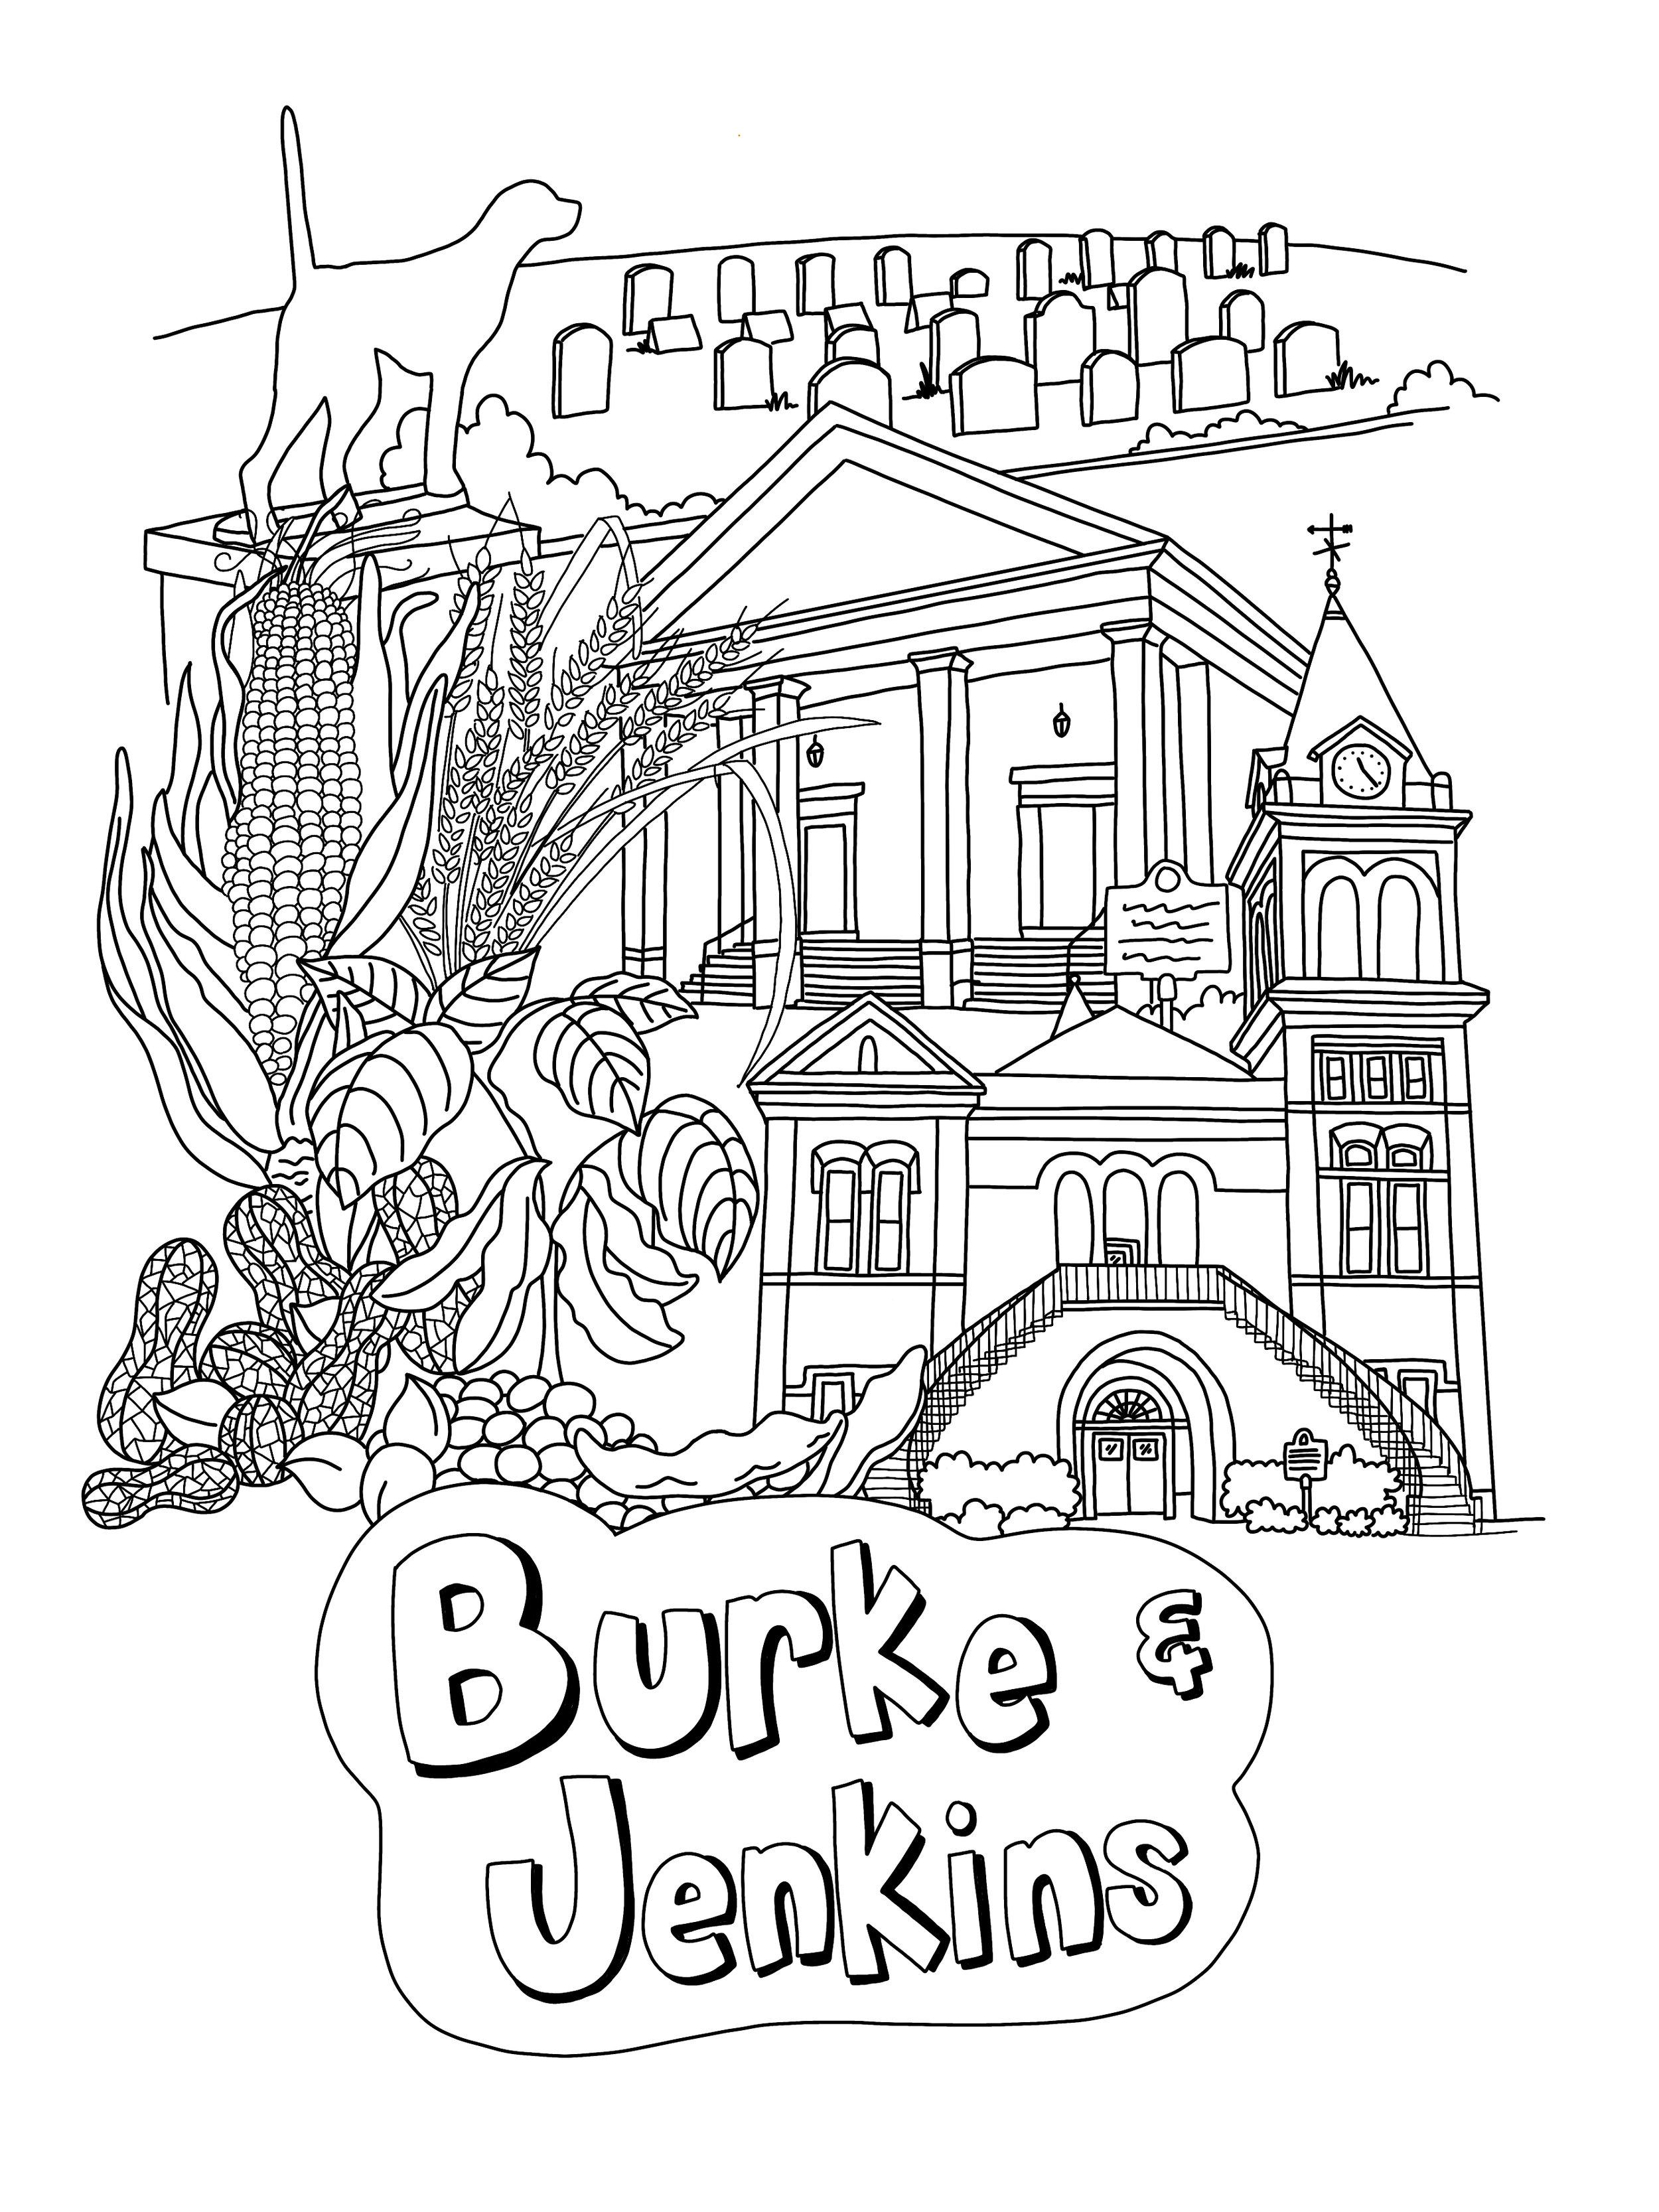 Burke Jenkins.jpg